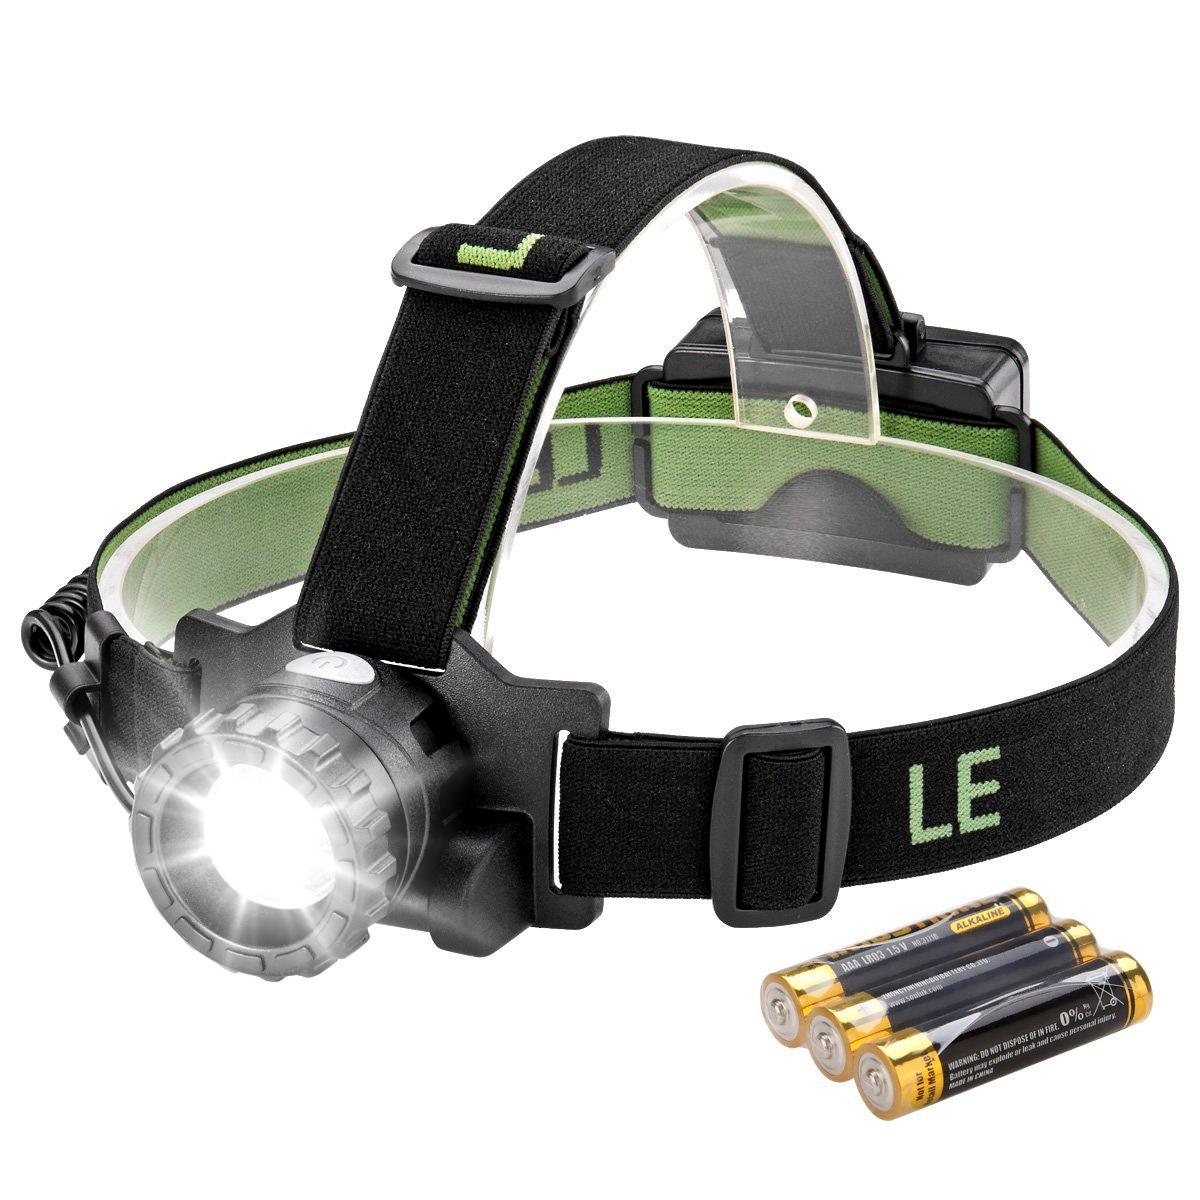 LED Headlight Torch Battery Powered Waterproof Headlamp ...